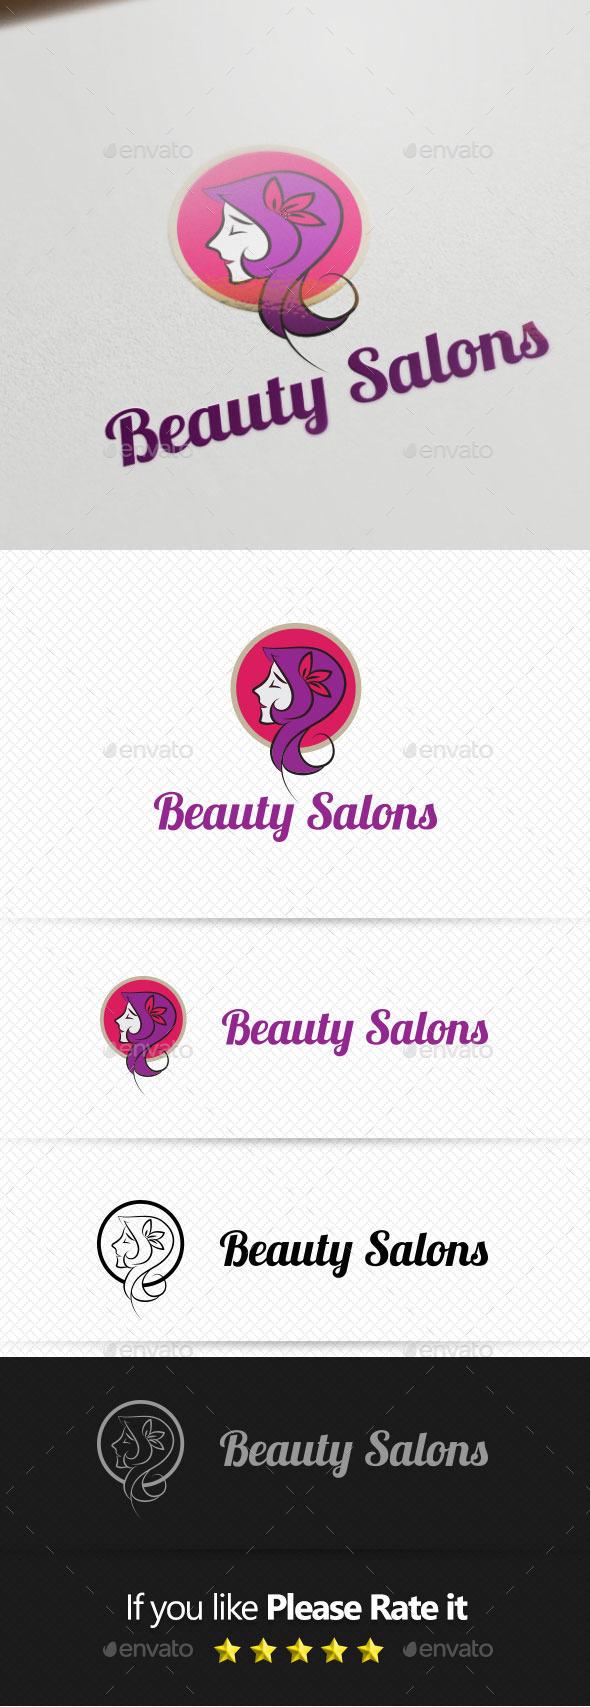 Beauty Salons Logo Template